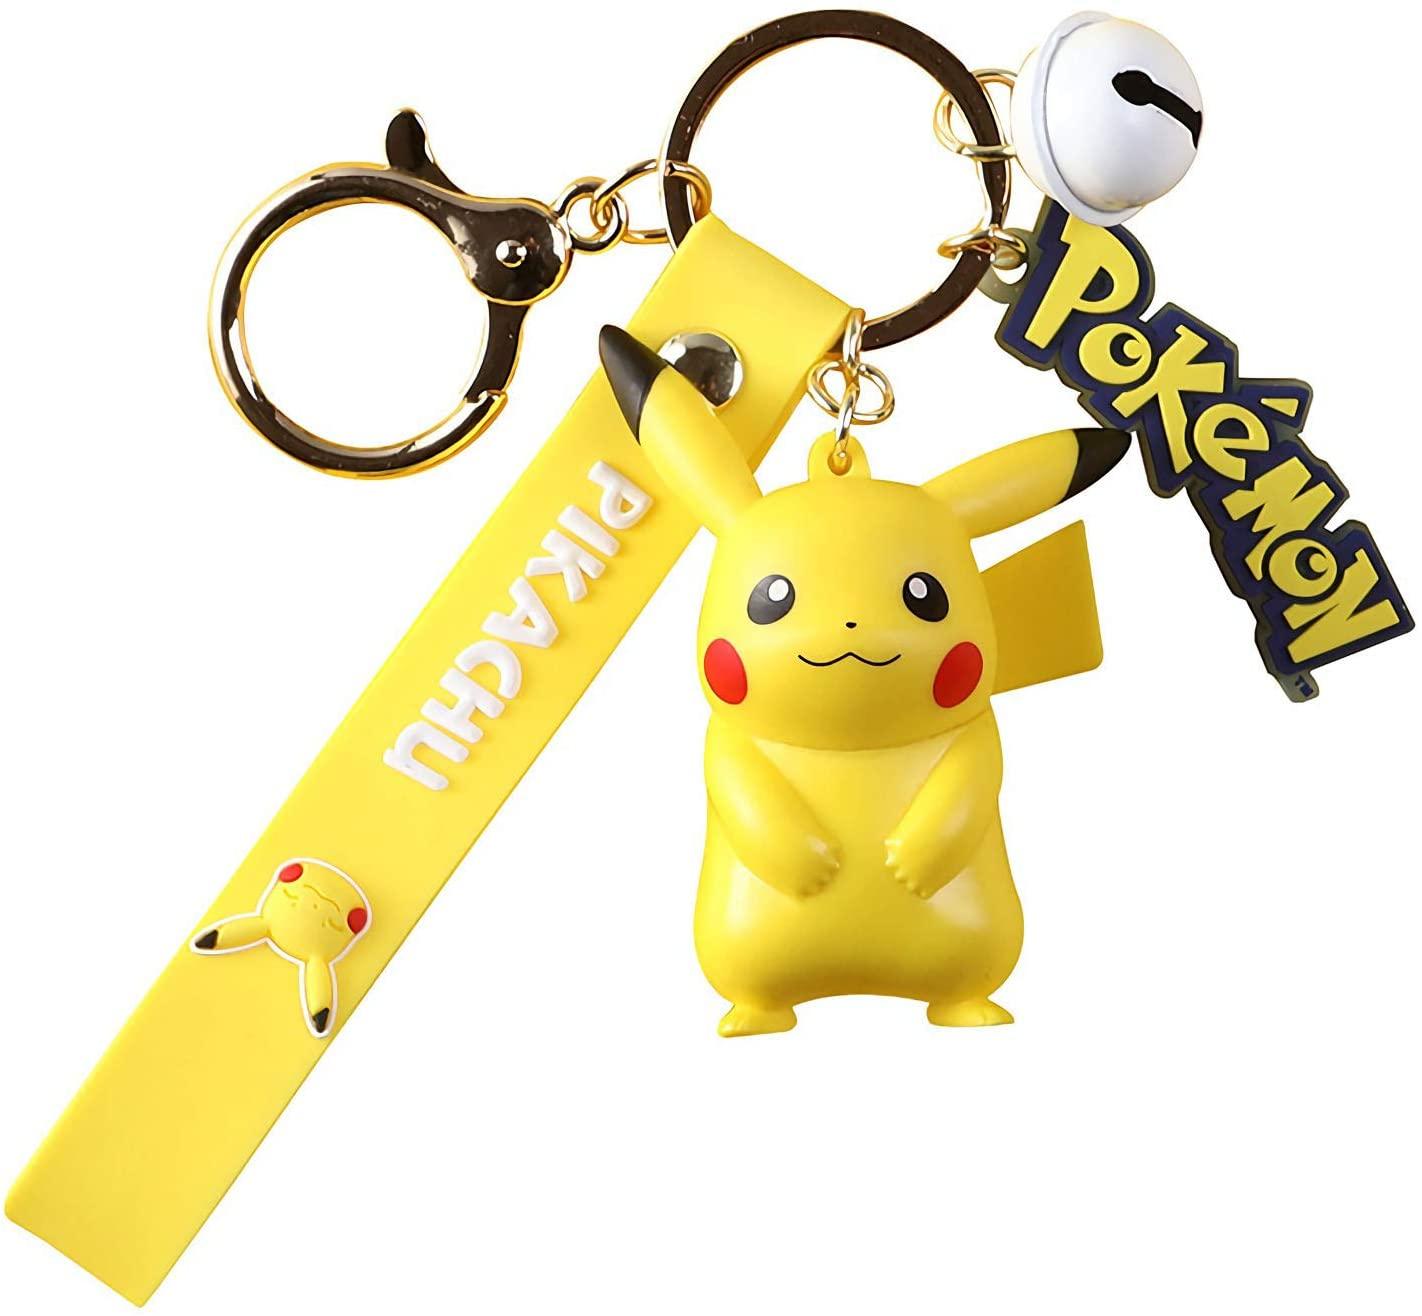 YJacuing Anime Pikachu Cute Figure Keychain (Pikachu)